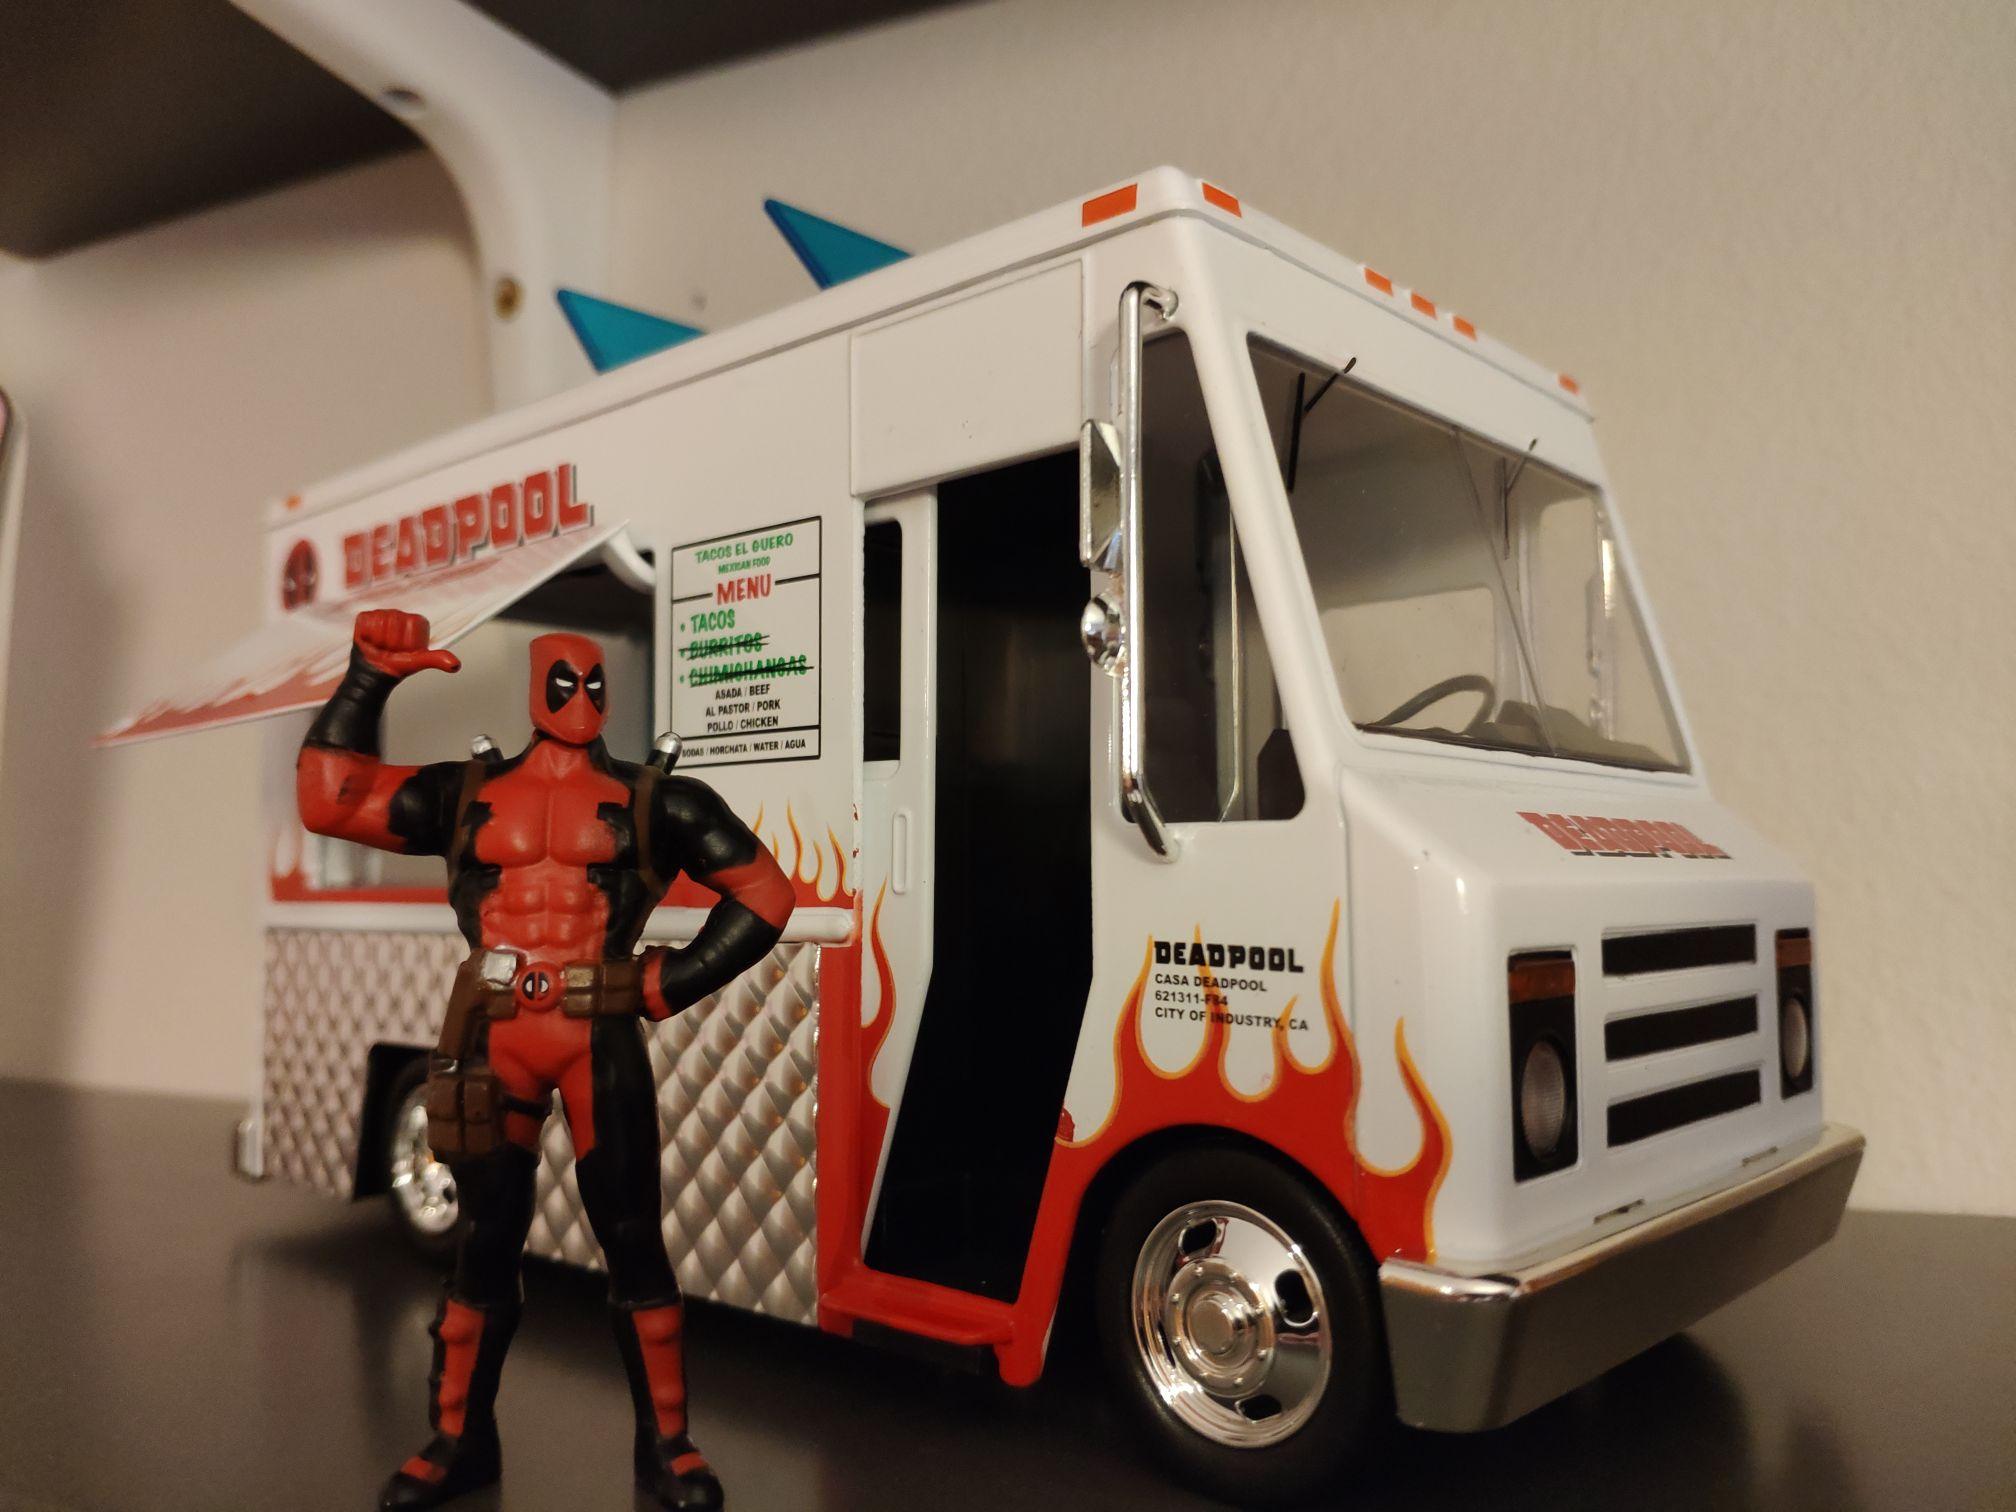 Foodtruck Deadpool